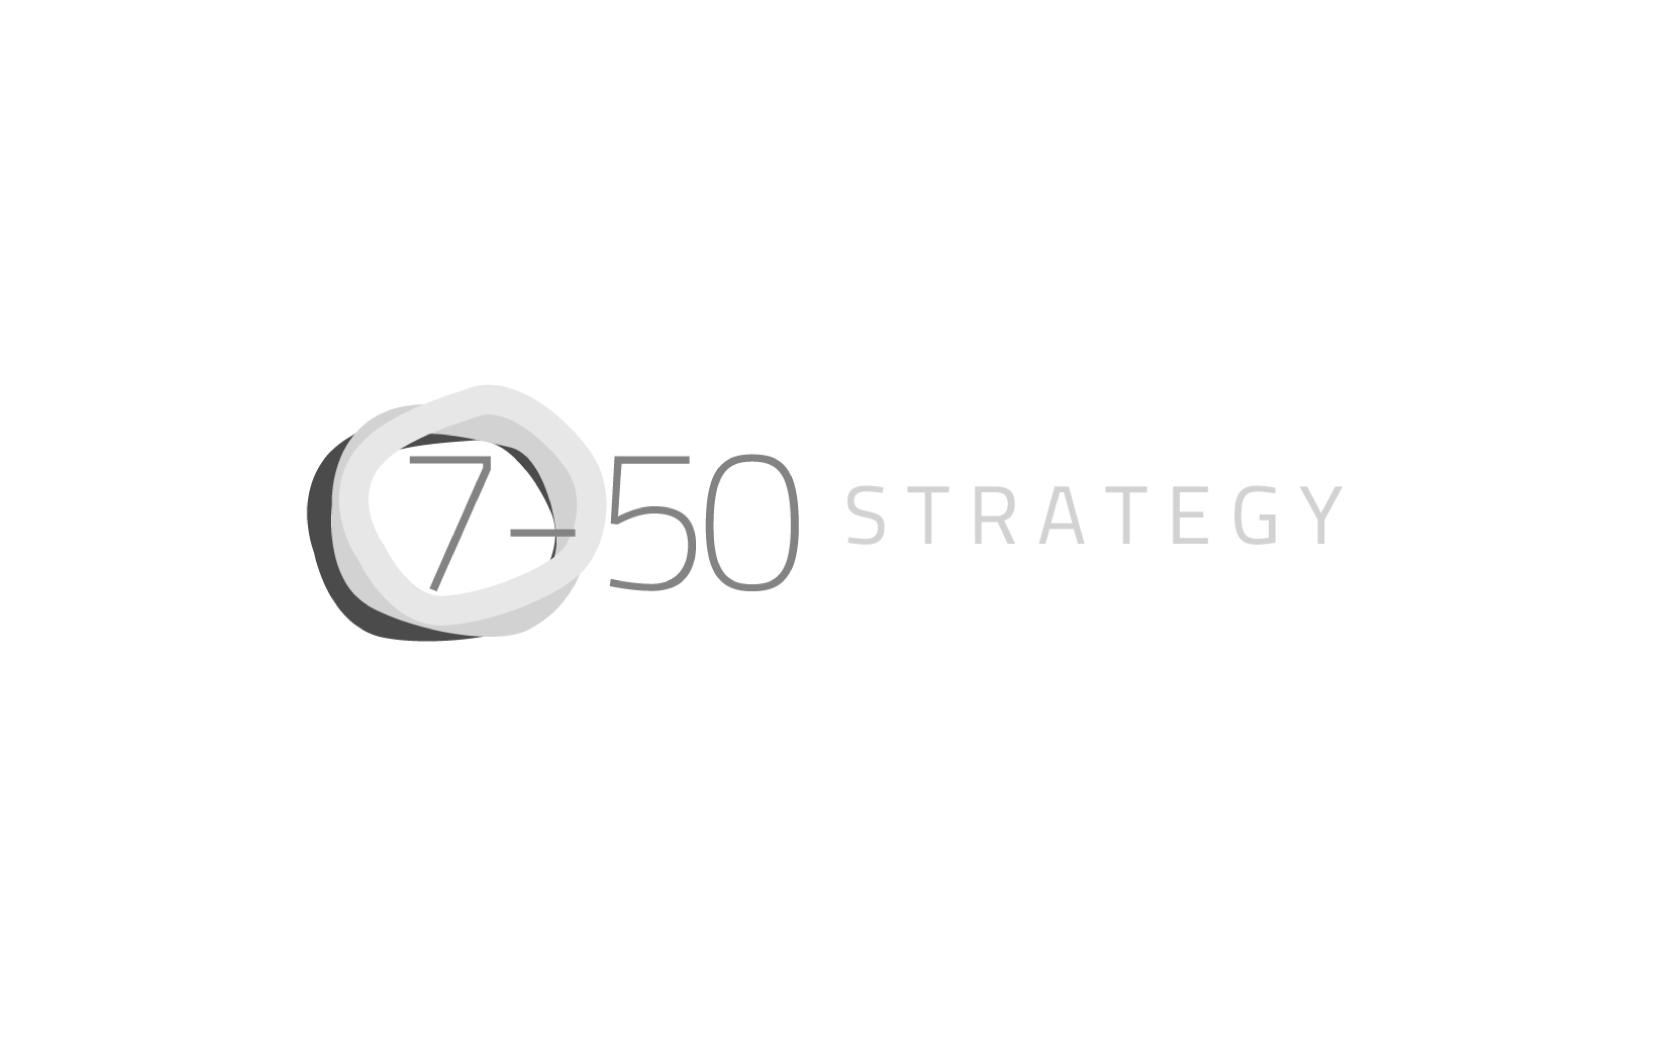 logo-750strategy